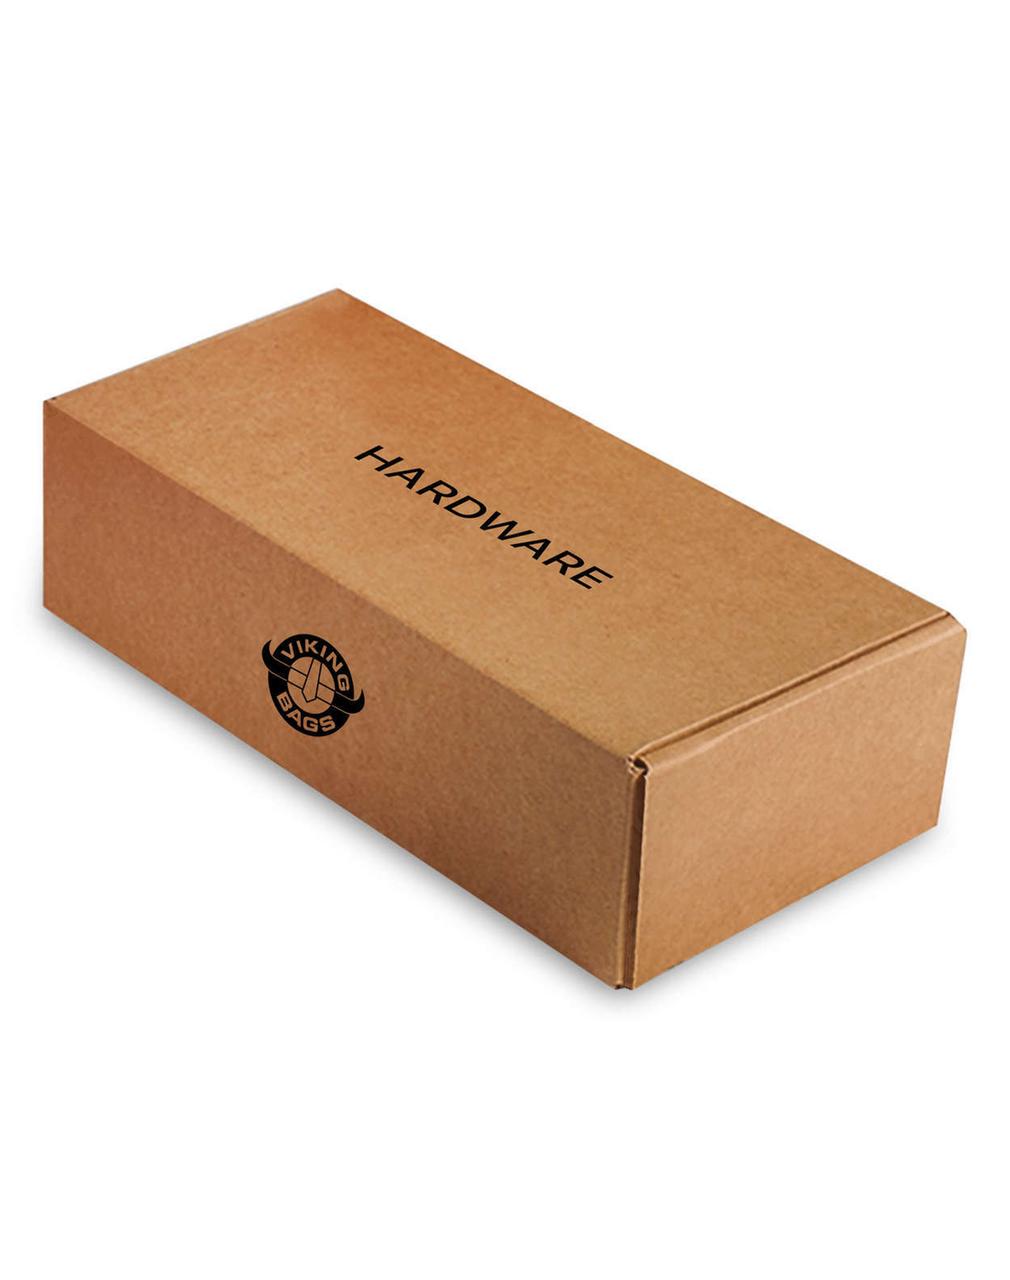 Triumph Thunderbird Viking Armor Shock Cutout Motorcycle Saddlebags Box